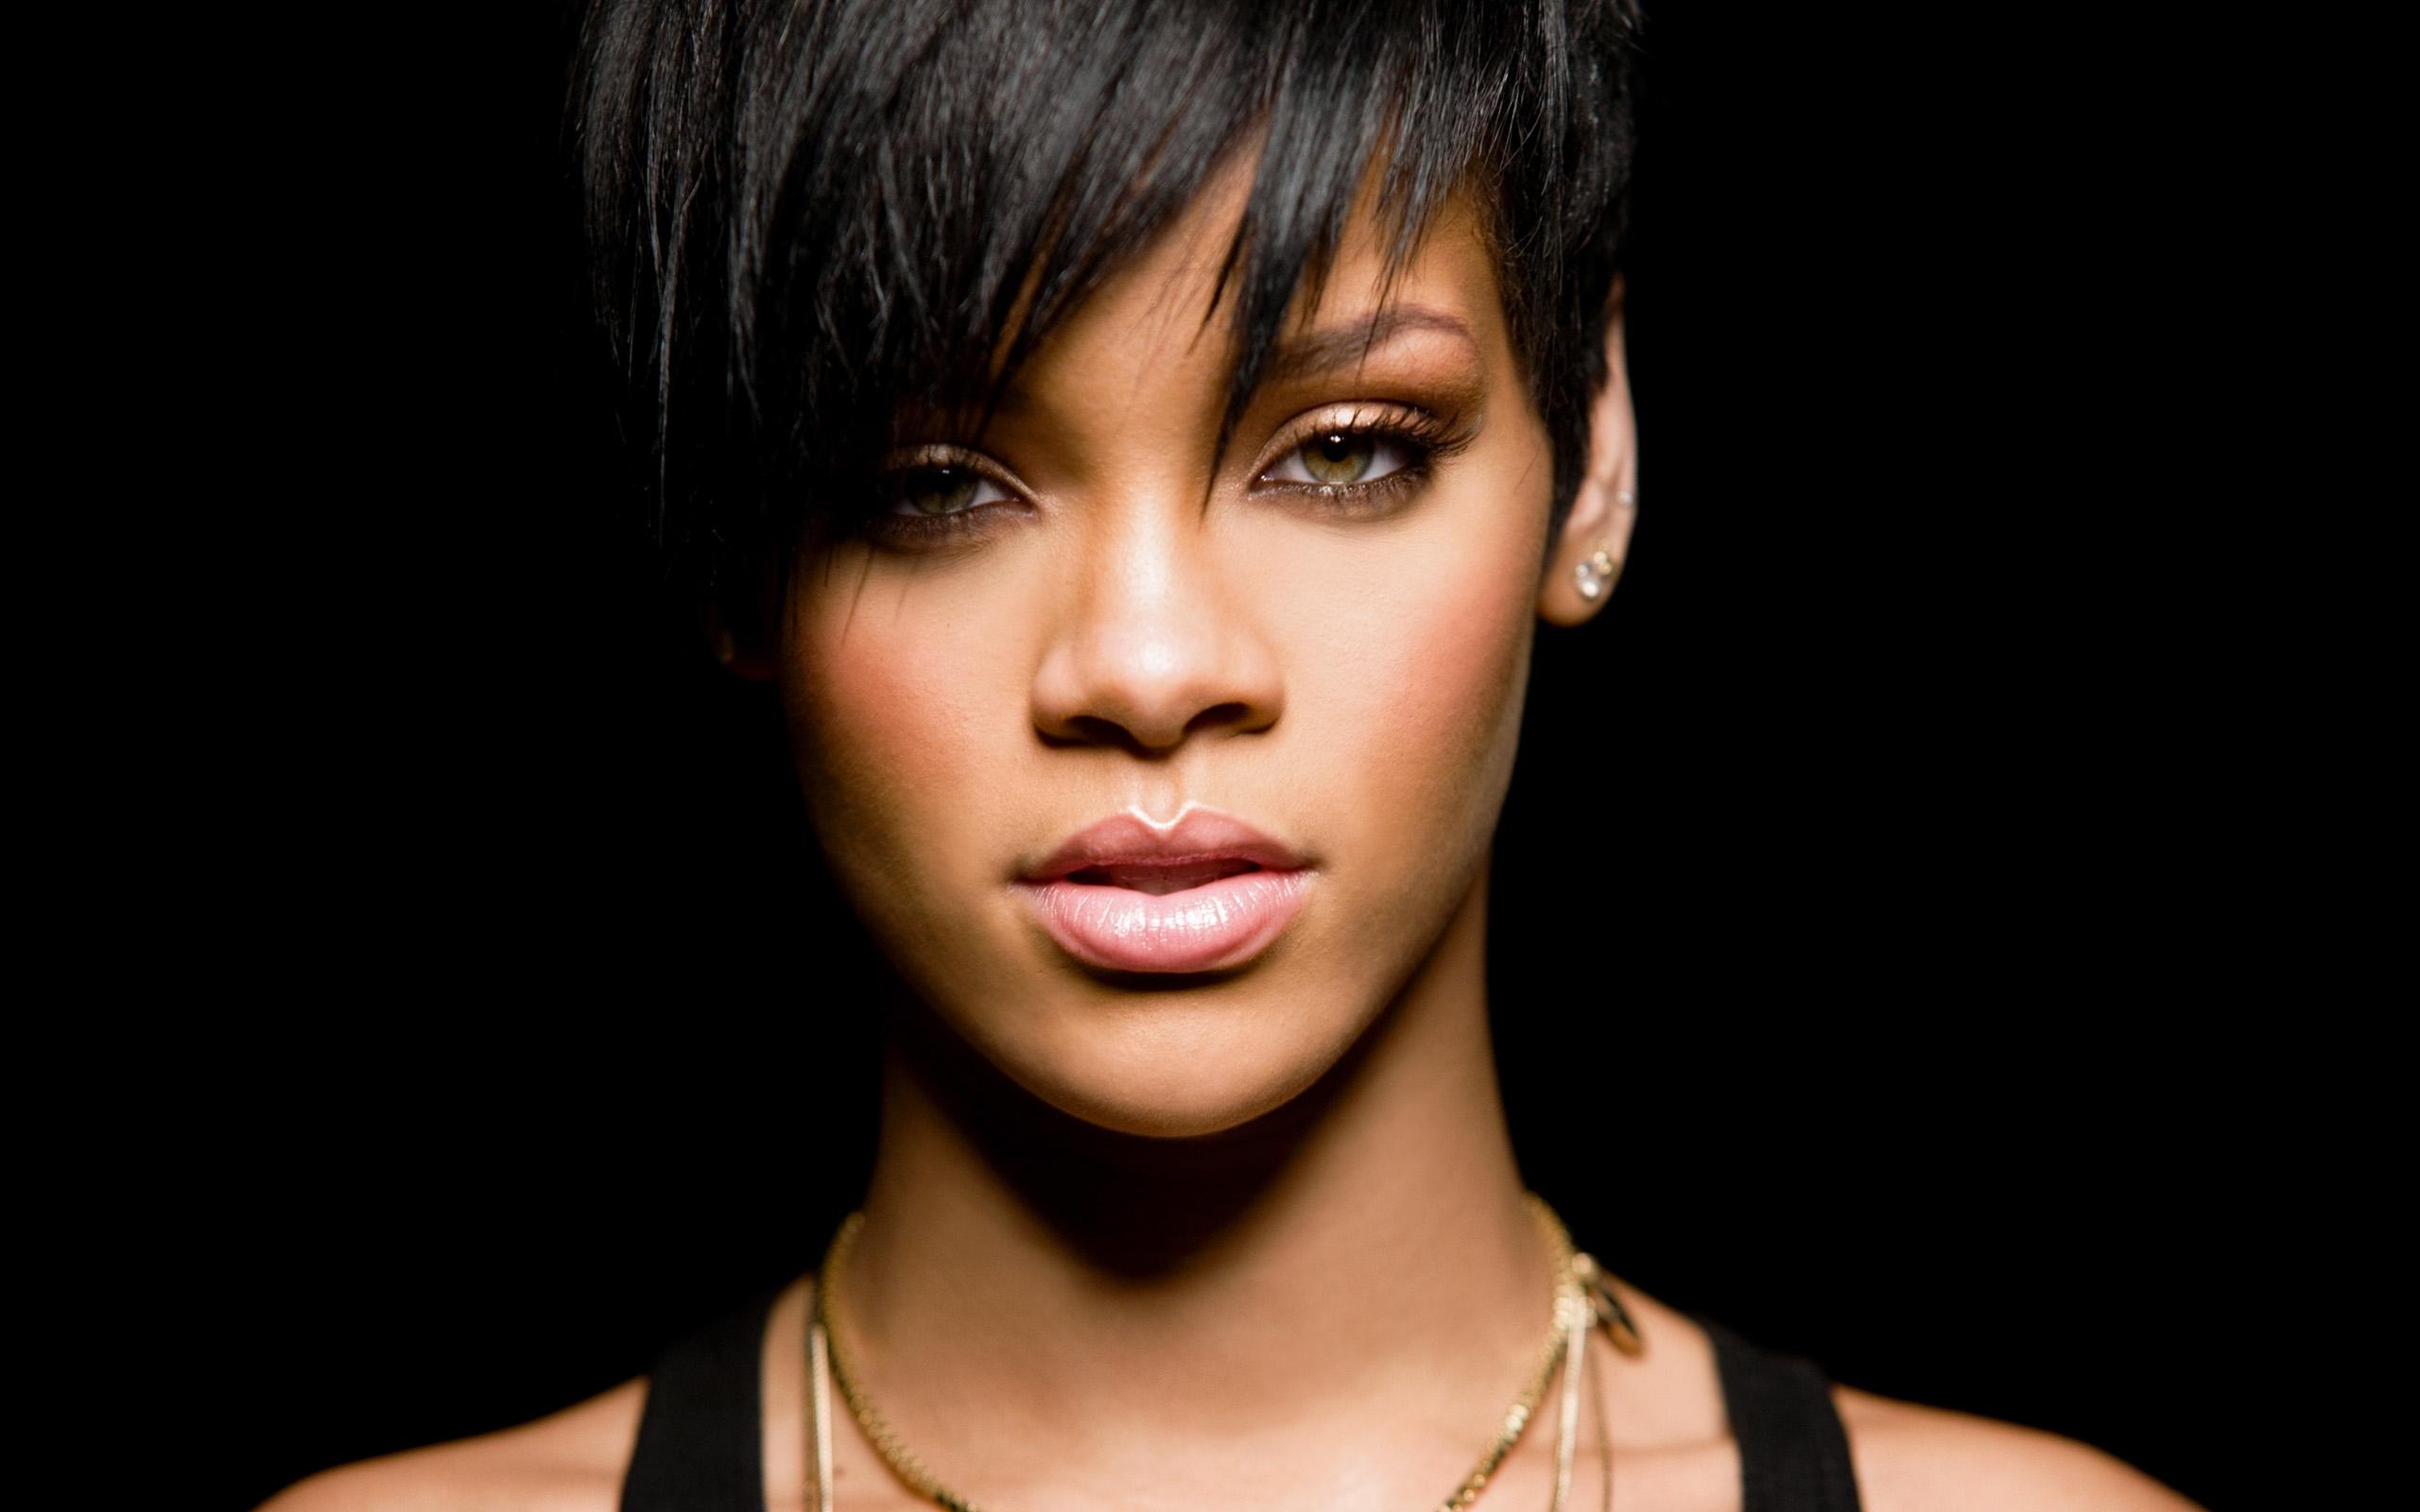 Rihanna 2015 Wallpaper singer look   HD Wallpapers Ultra HD 2560x1600